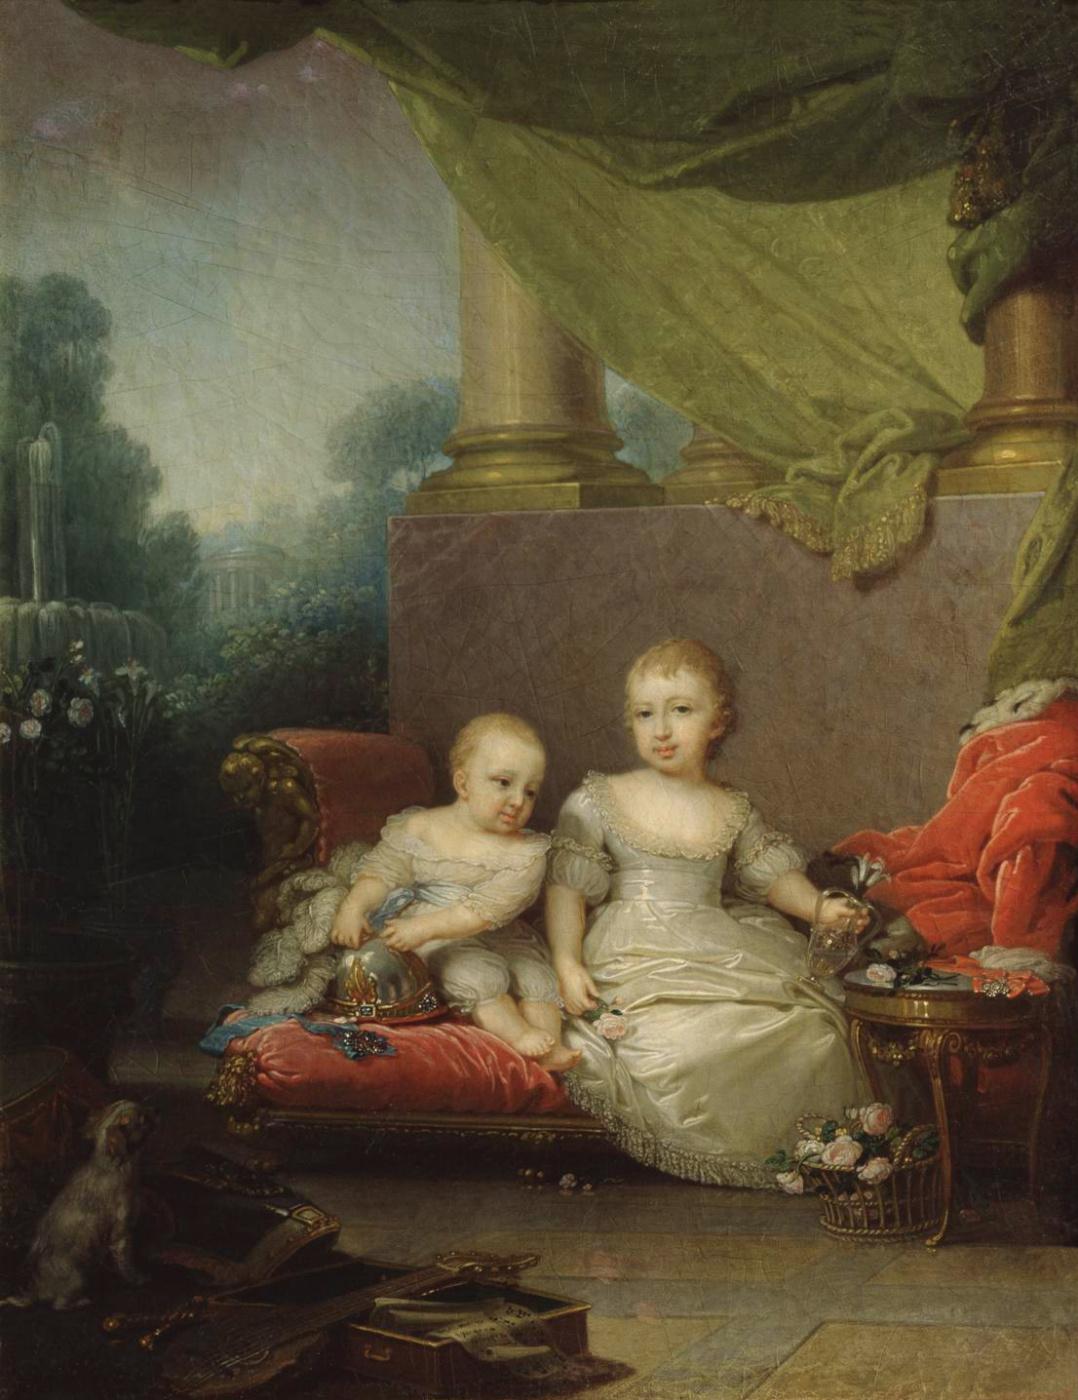 Vladimir Borovikovsky. Porret of Grand Duke Nikolai Pavlovich and Grand Duchess Anna Pavlovna, children of Paul I